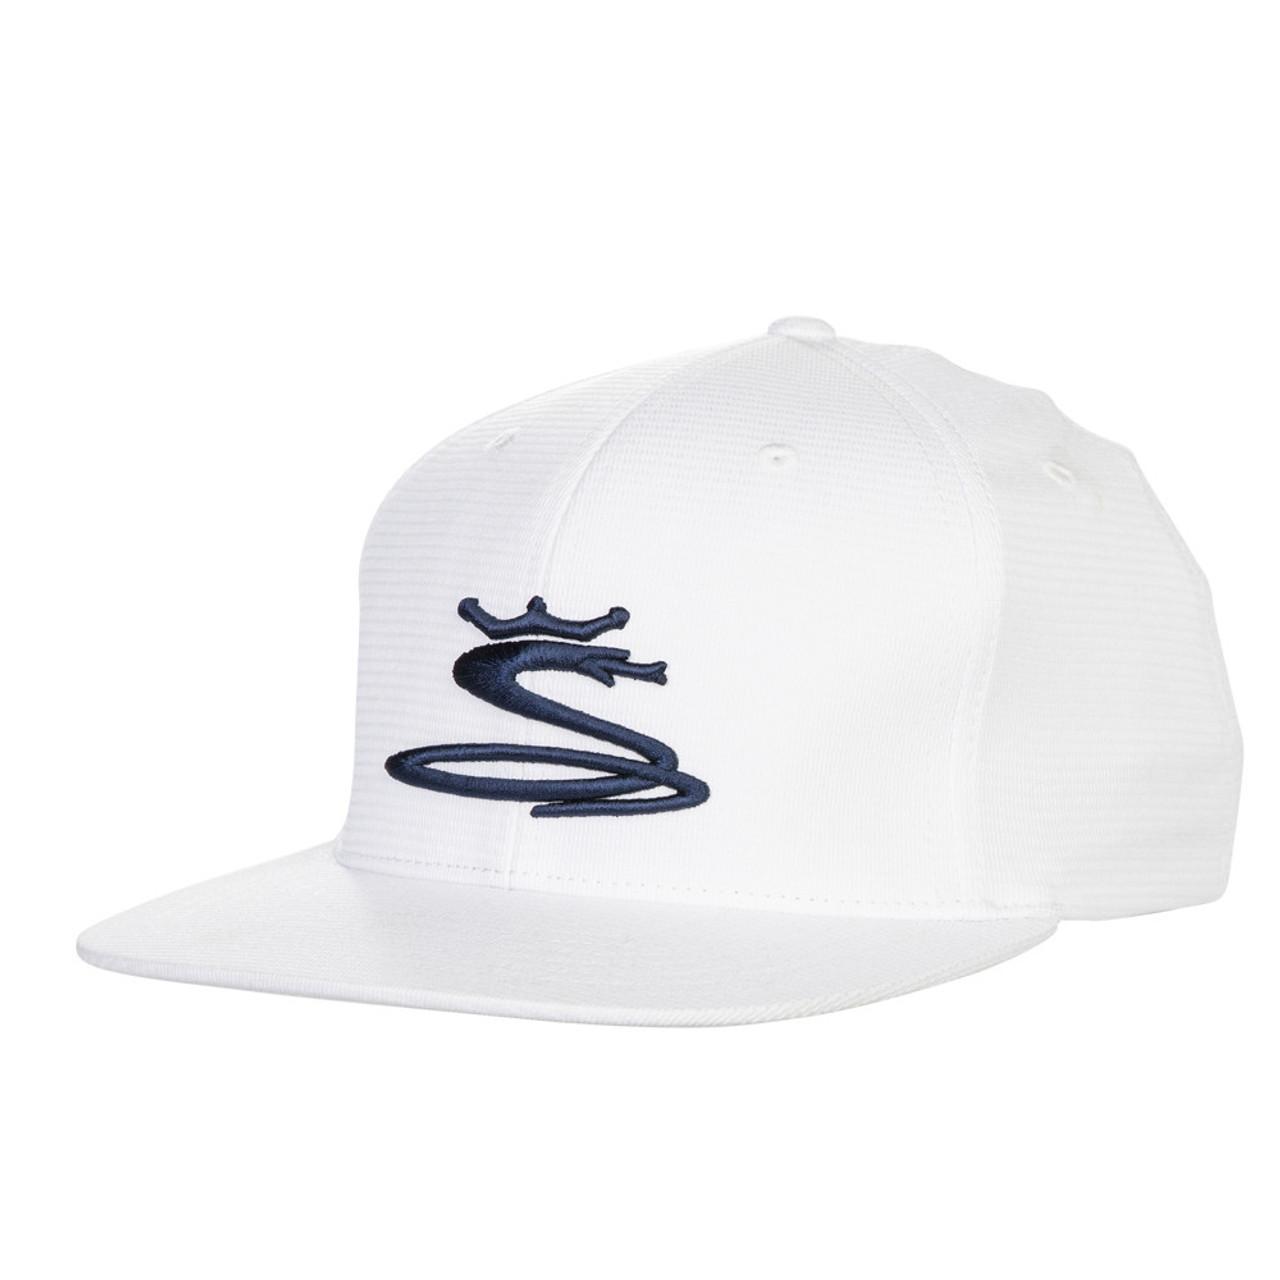 Cobra Tour Snake Snapback Caps - White / Peacoat